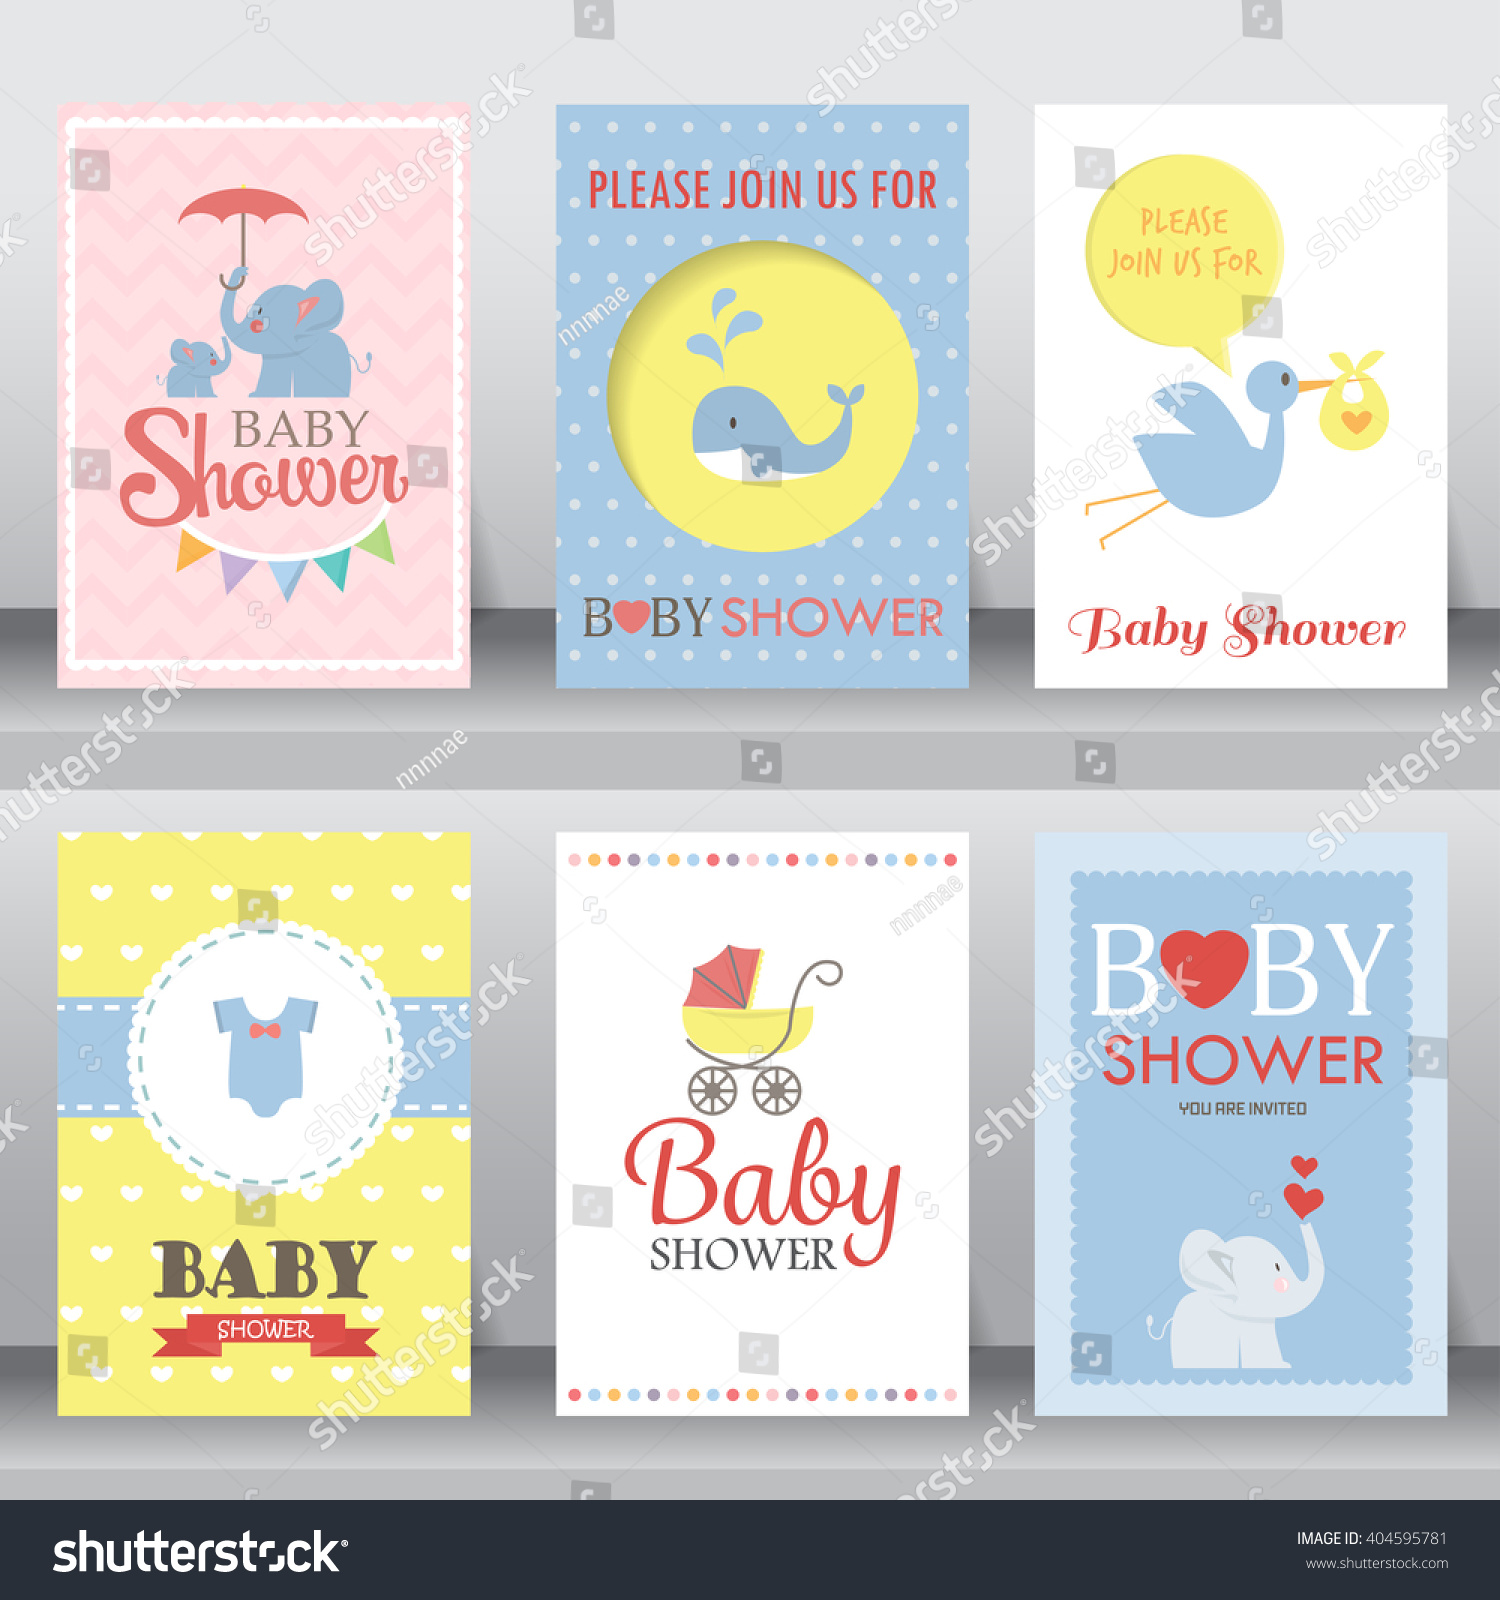 happy birthday baby shower for newborn celebration greeting and